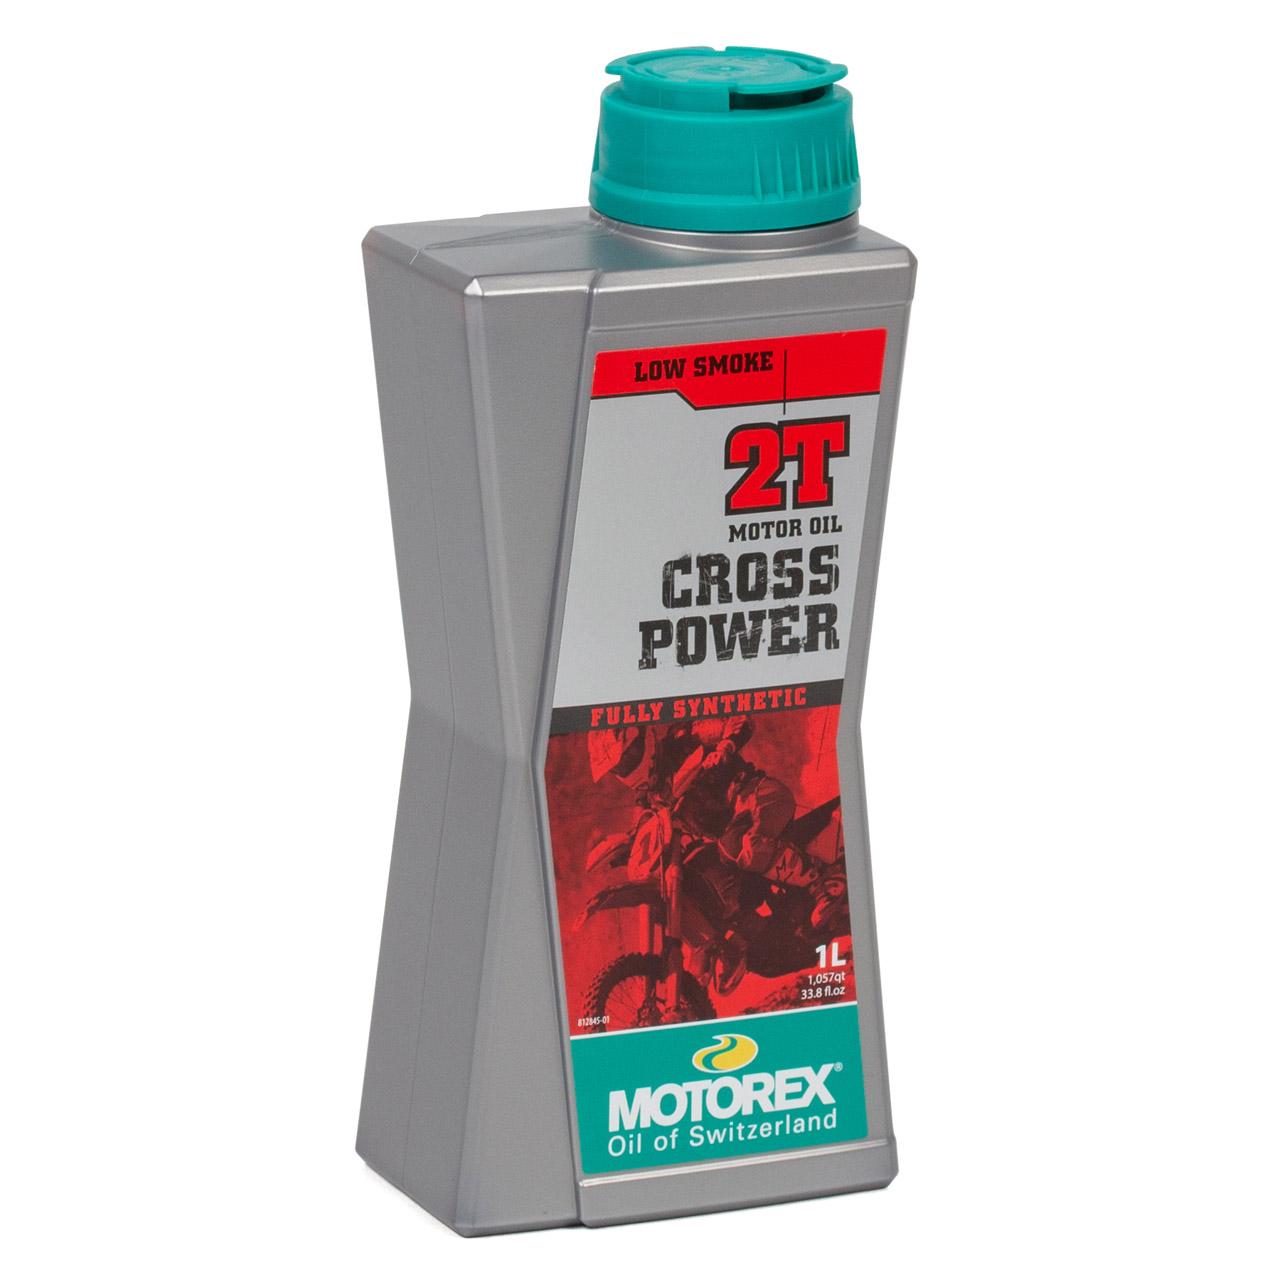 MOTOREX Cross Power 2T LOW SMOKE Motoröl API TC JASO FD ISO-L-EGD - 4L 4 Liter